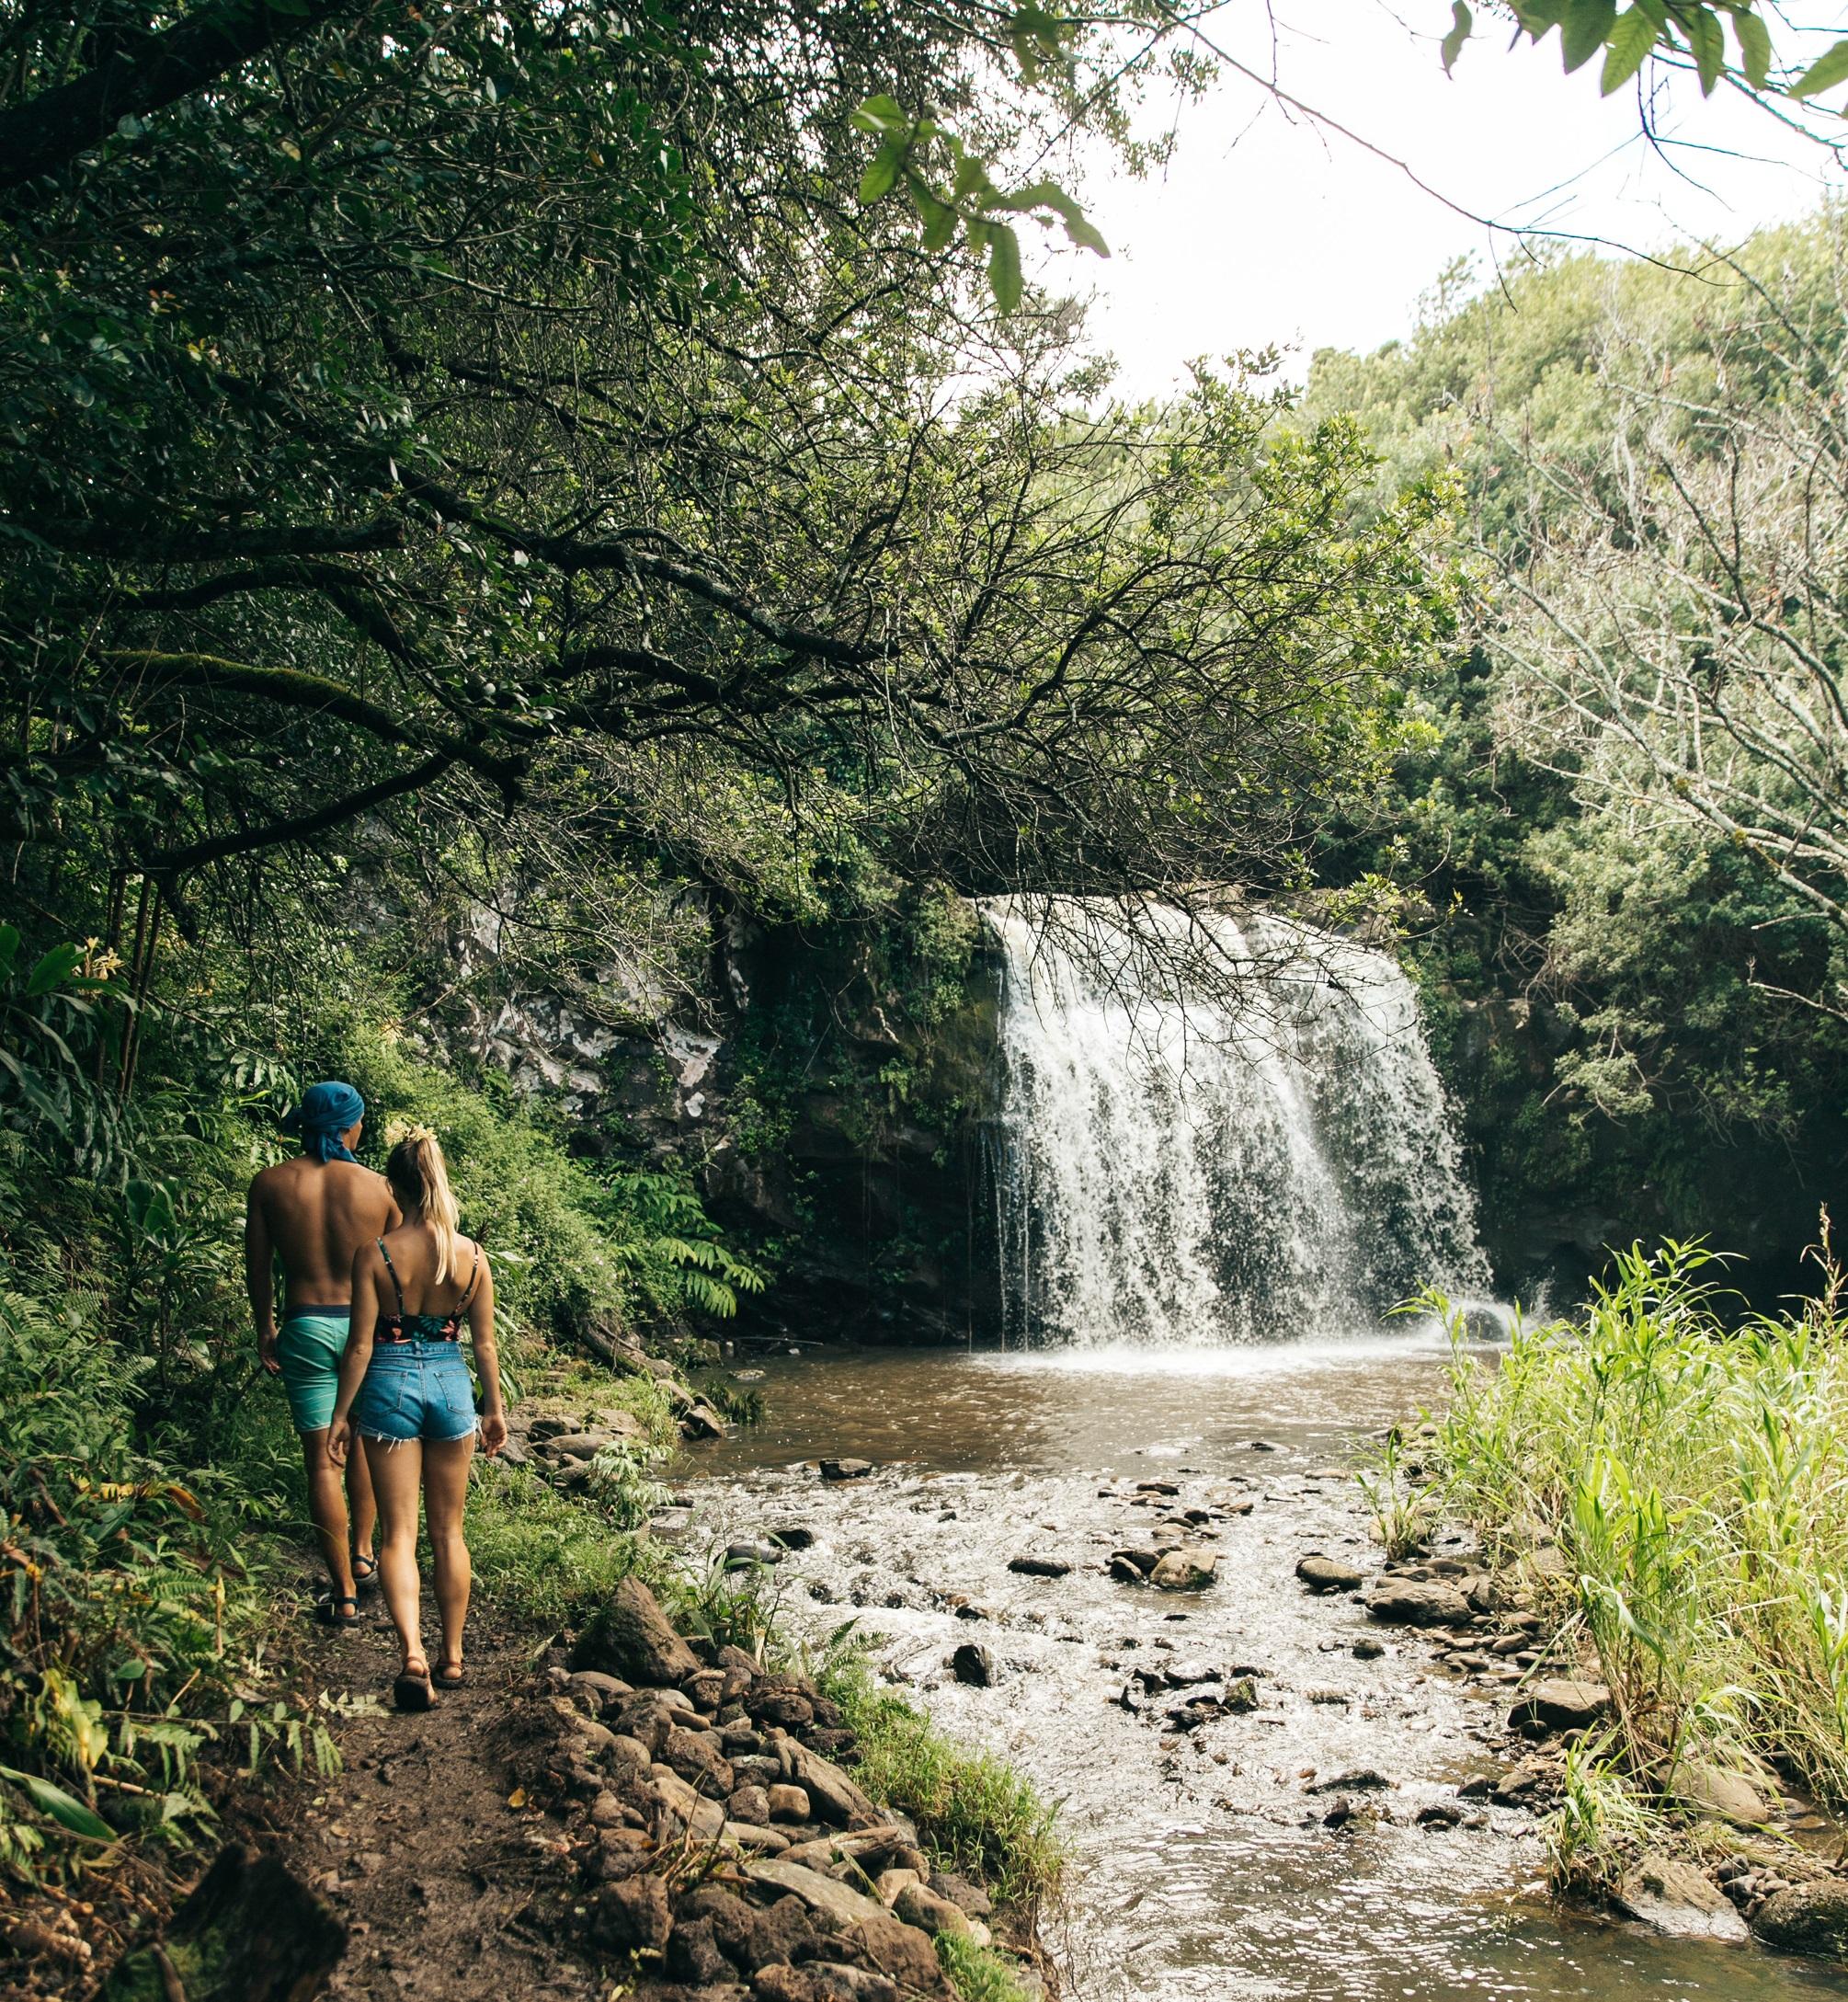 HAWAII FOREST & TRAIL, ISLAND OF HAWAII/OAHU